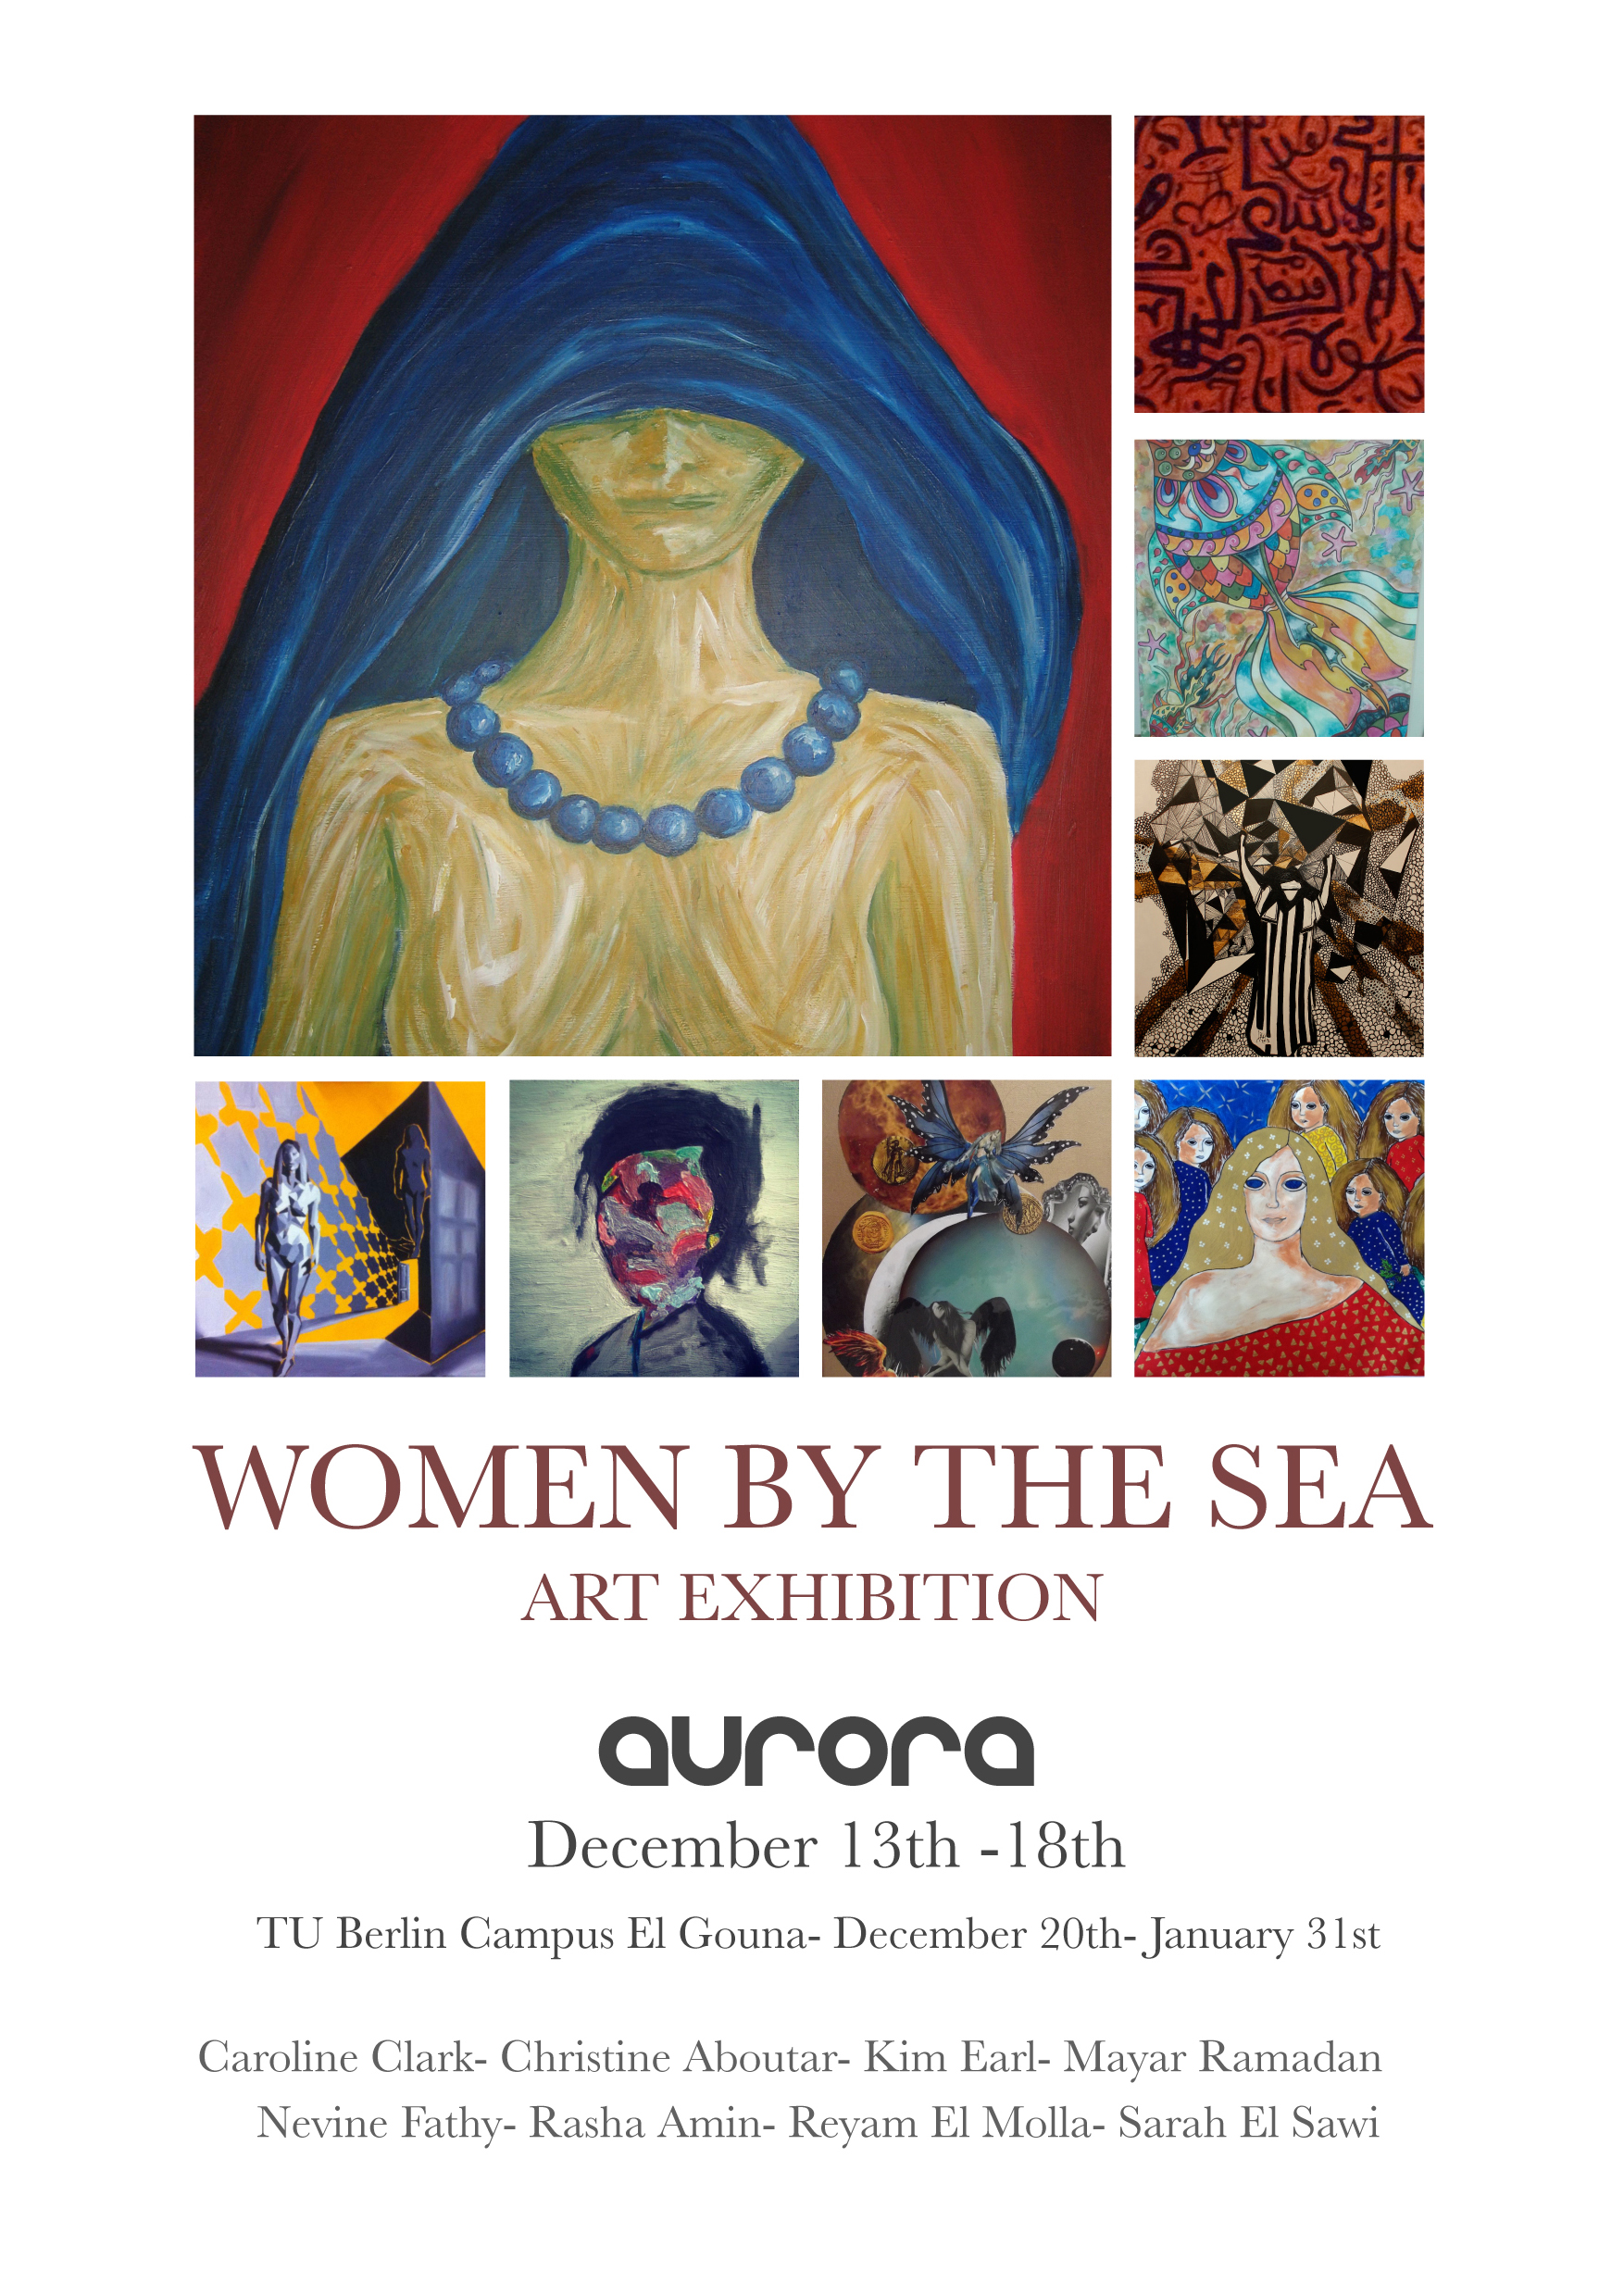 07 Women by the sea front flyer.jpg